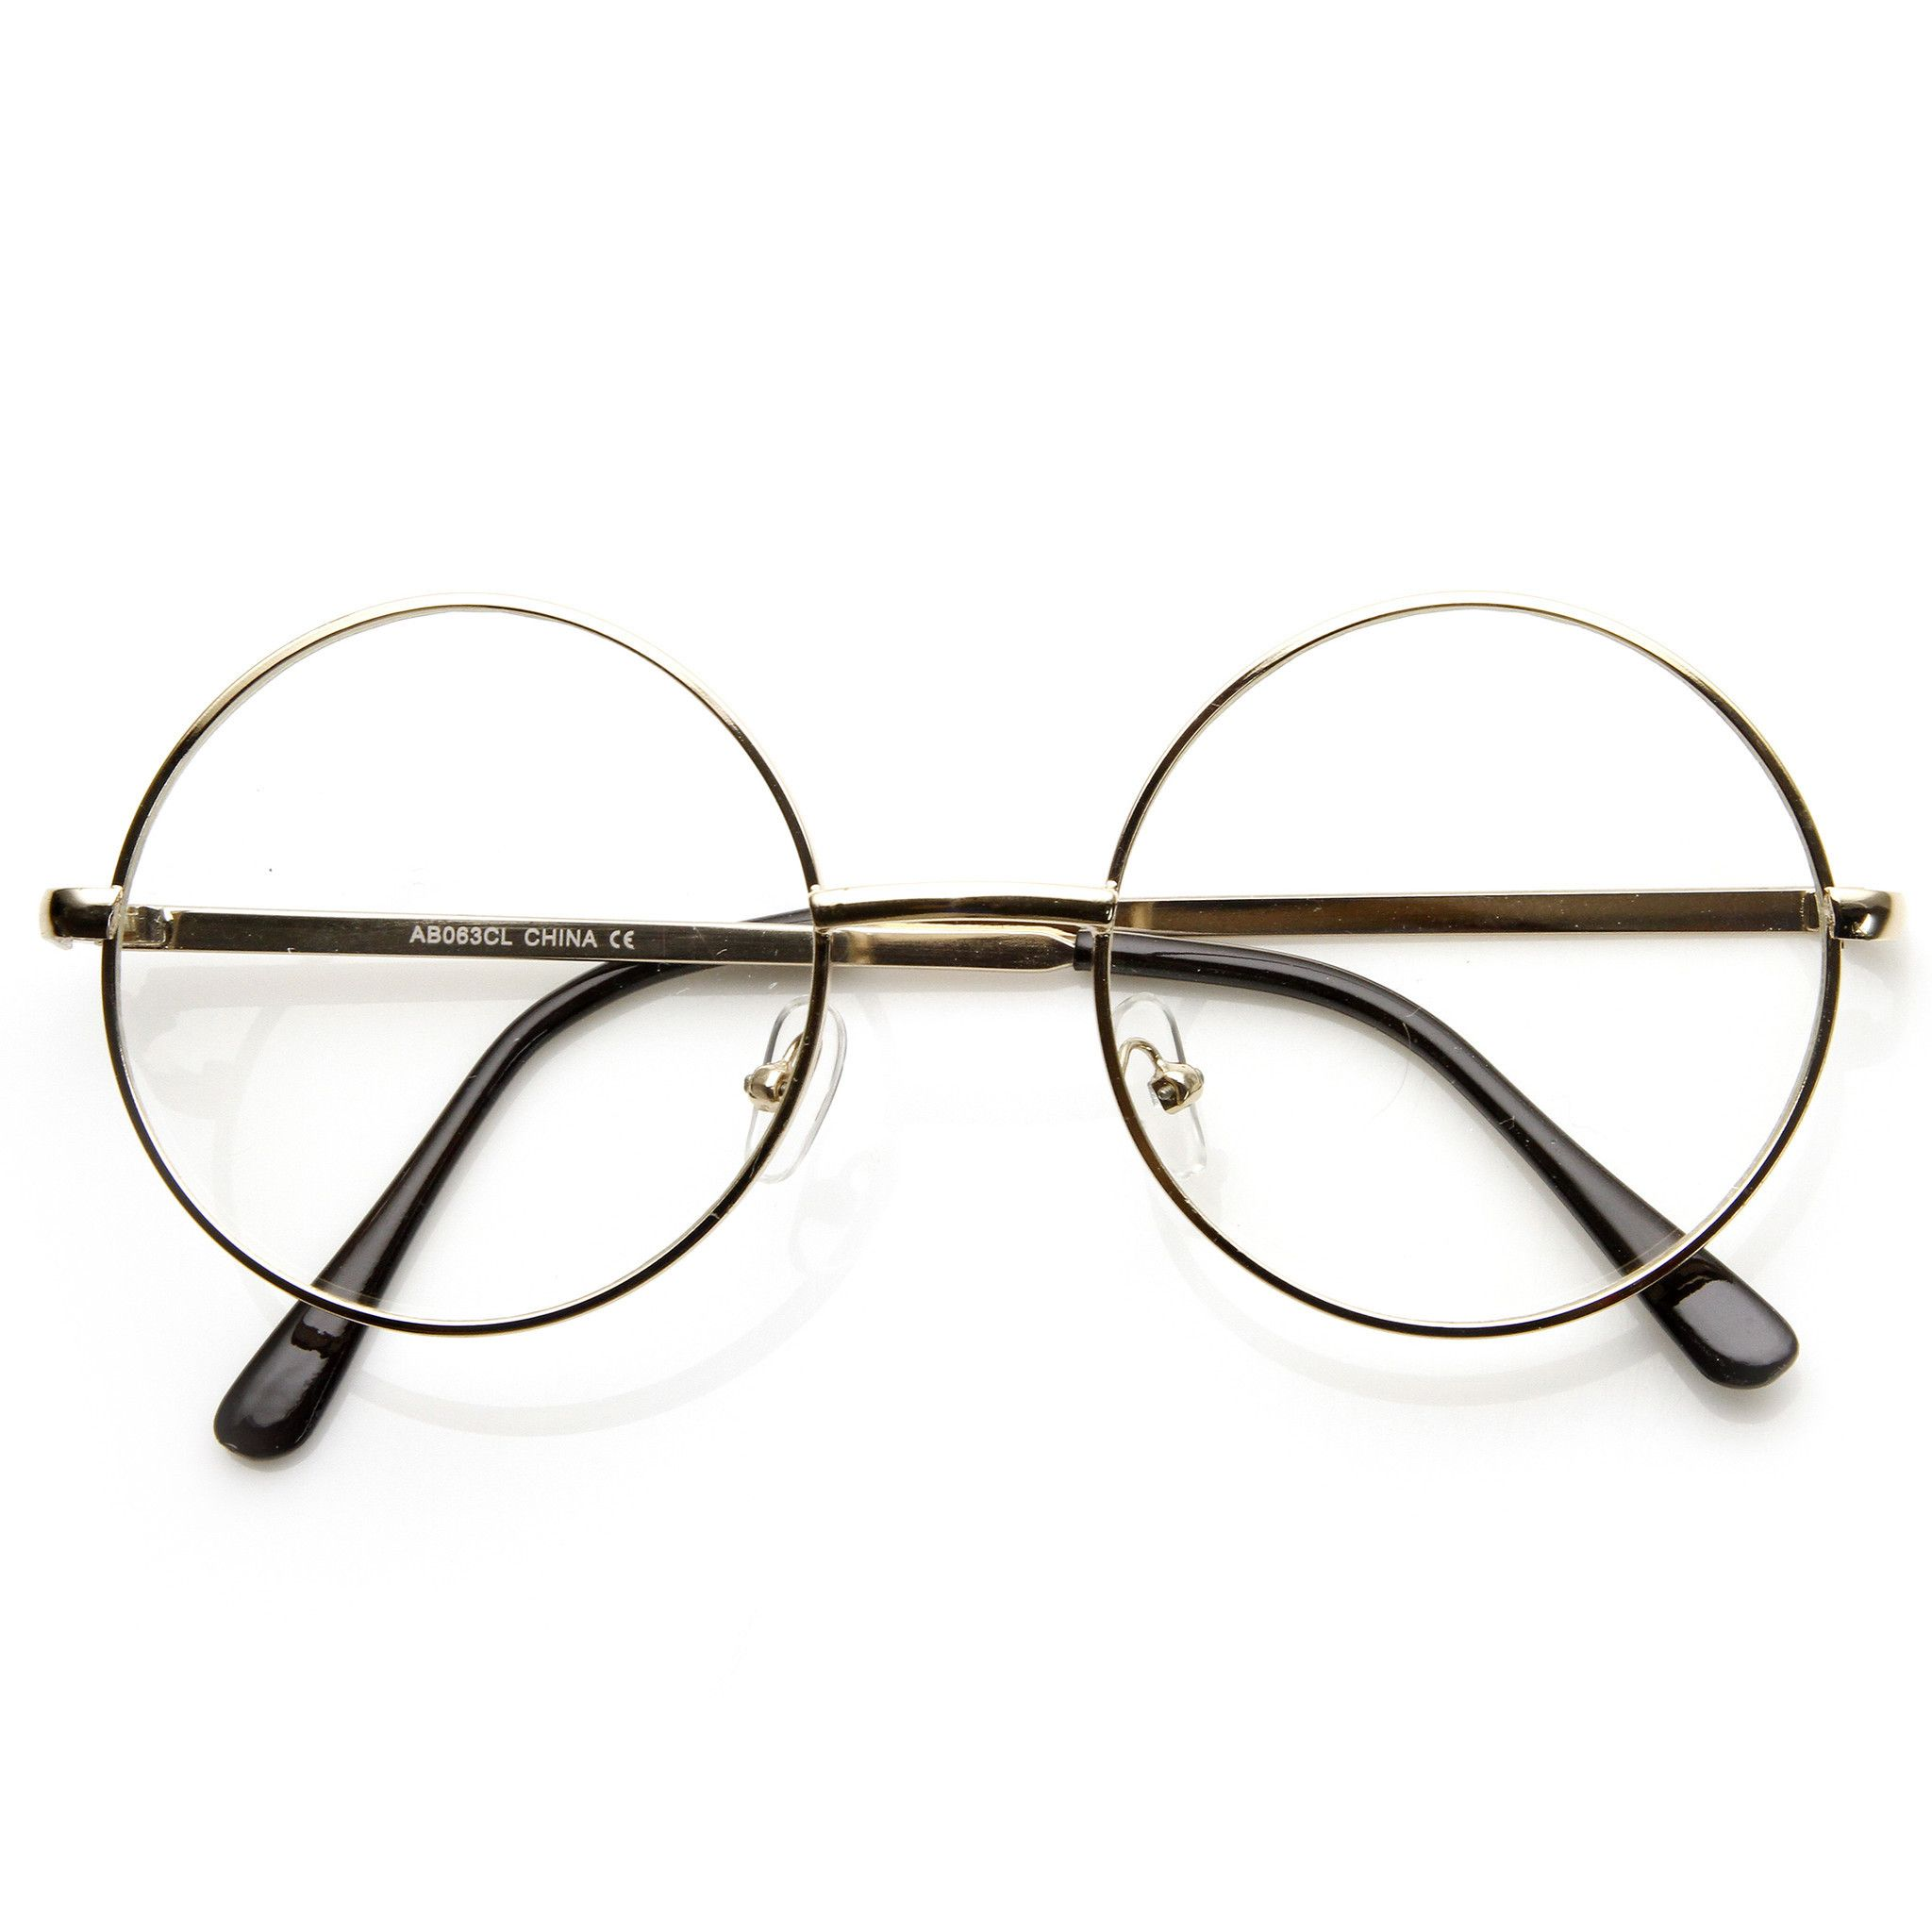 Costume Harry Potter Movie Novelty Clear Lens Glasses 9222